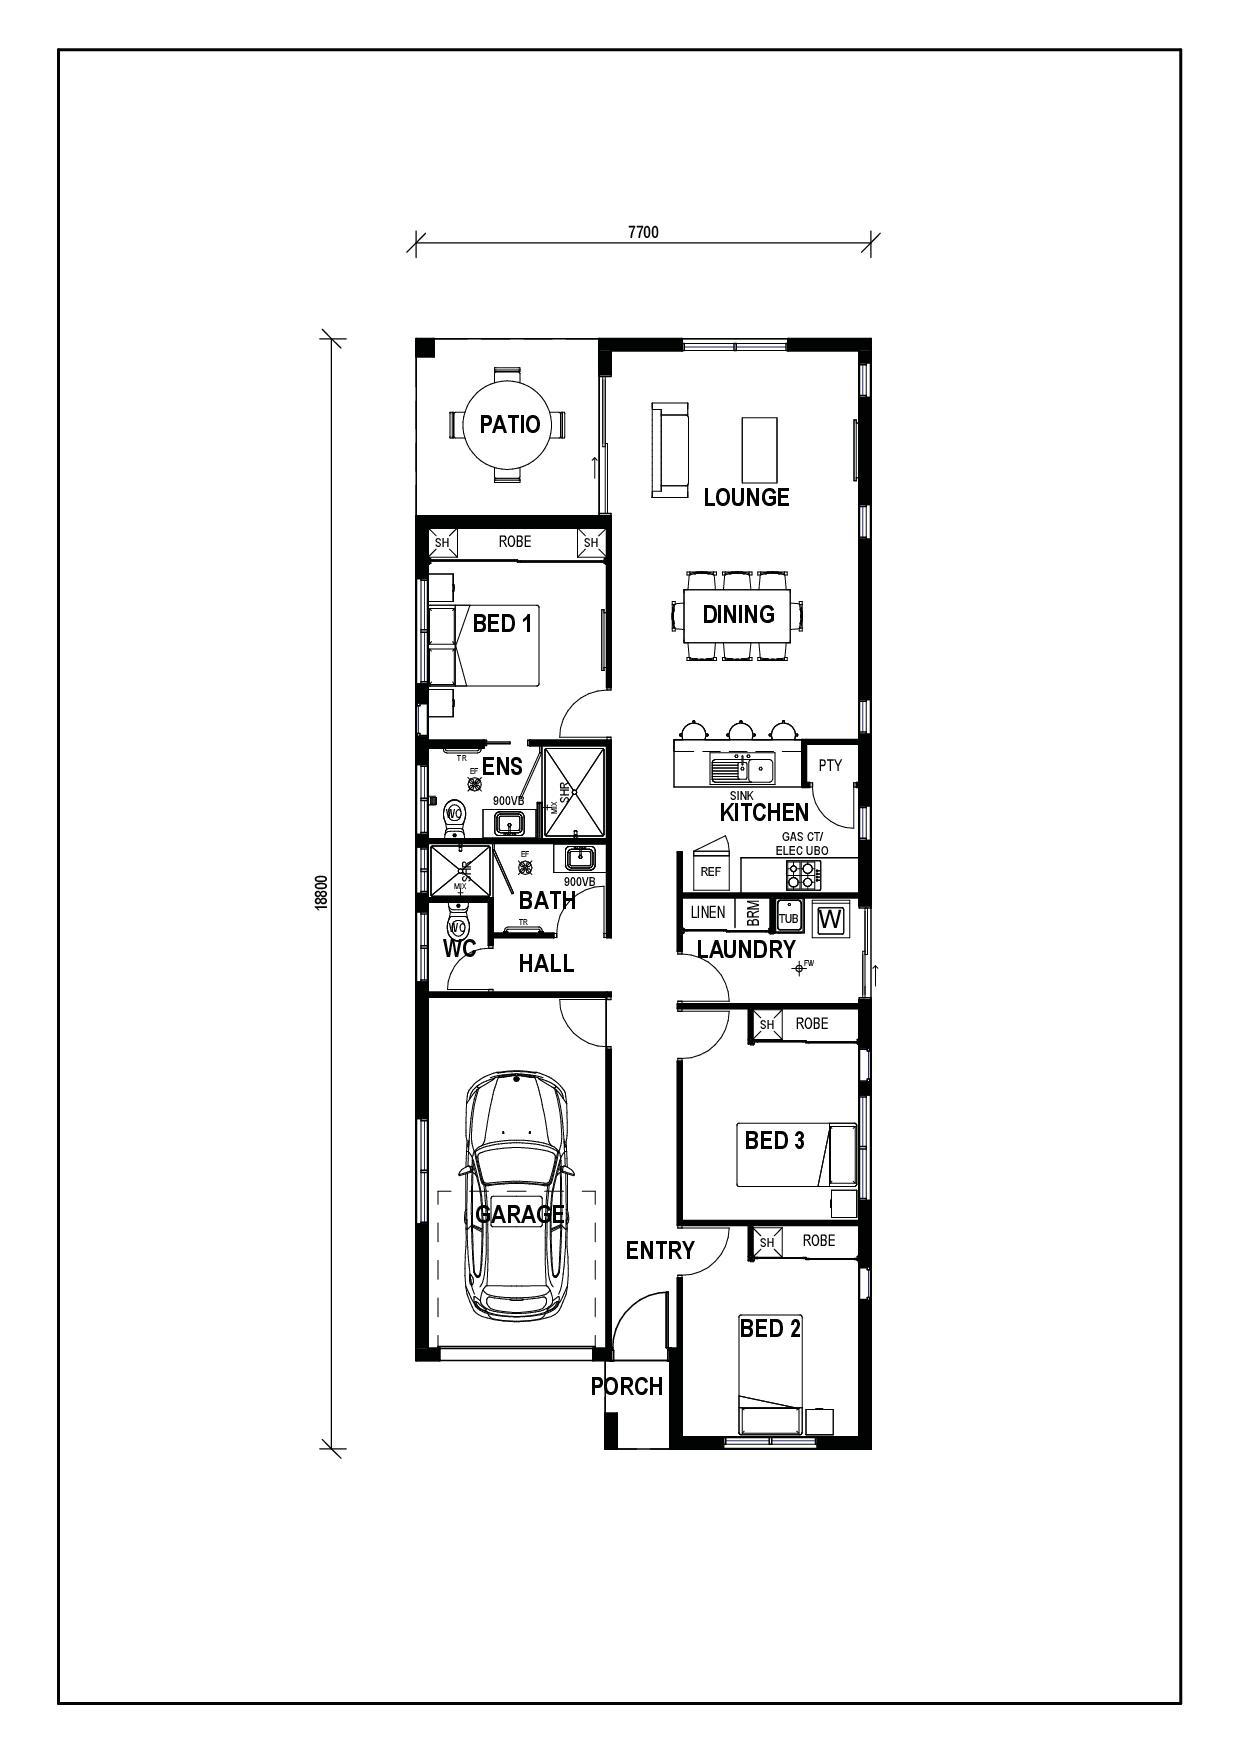 Culmara A Floor Plan.jpg